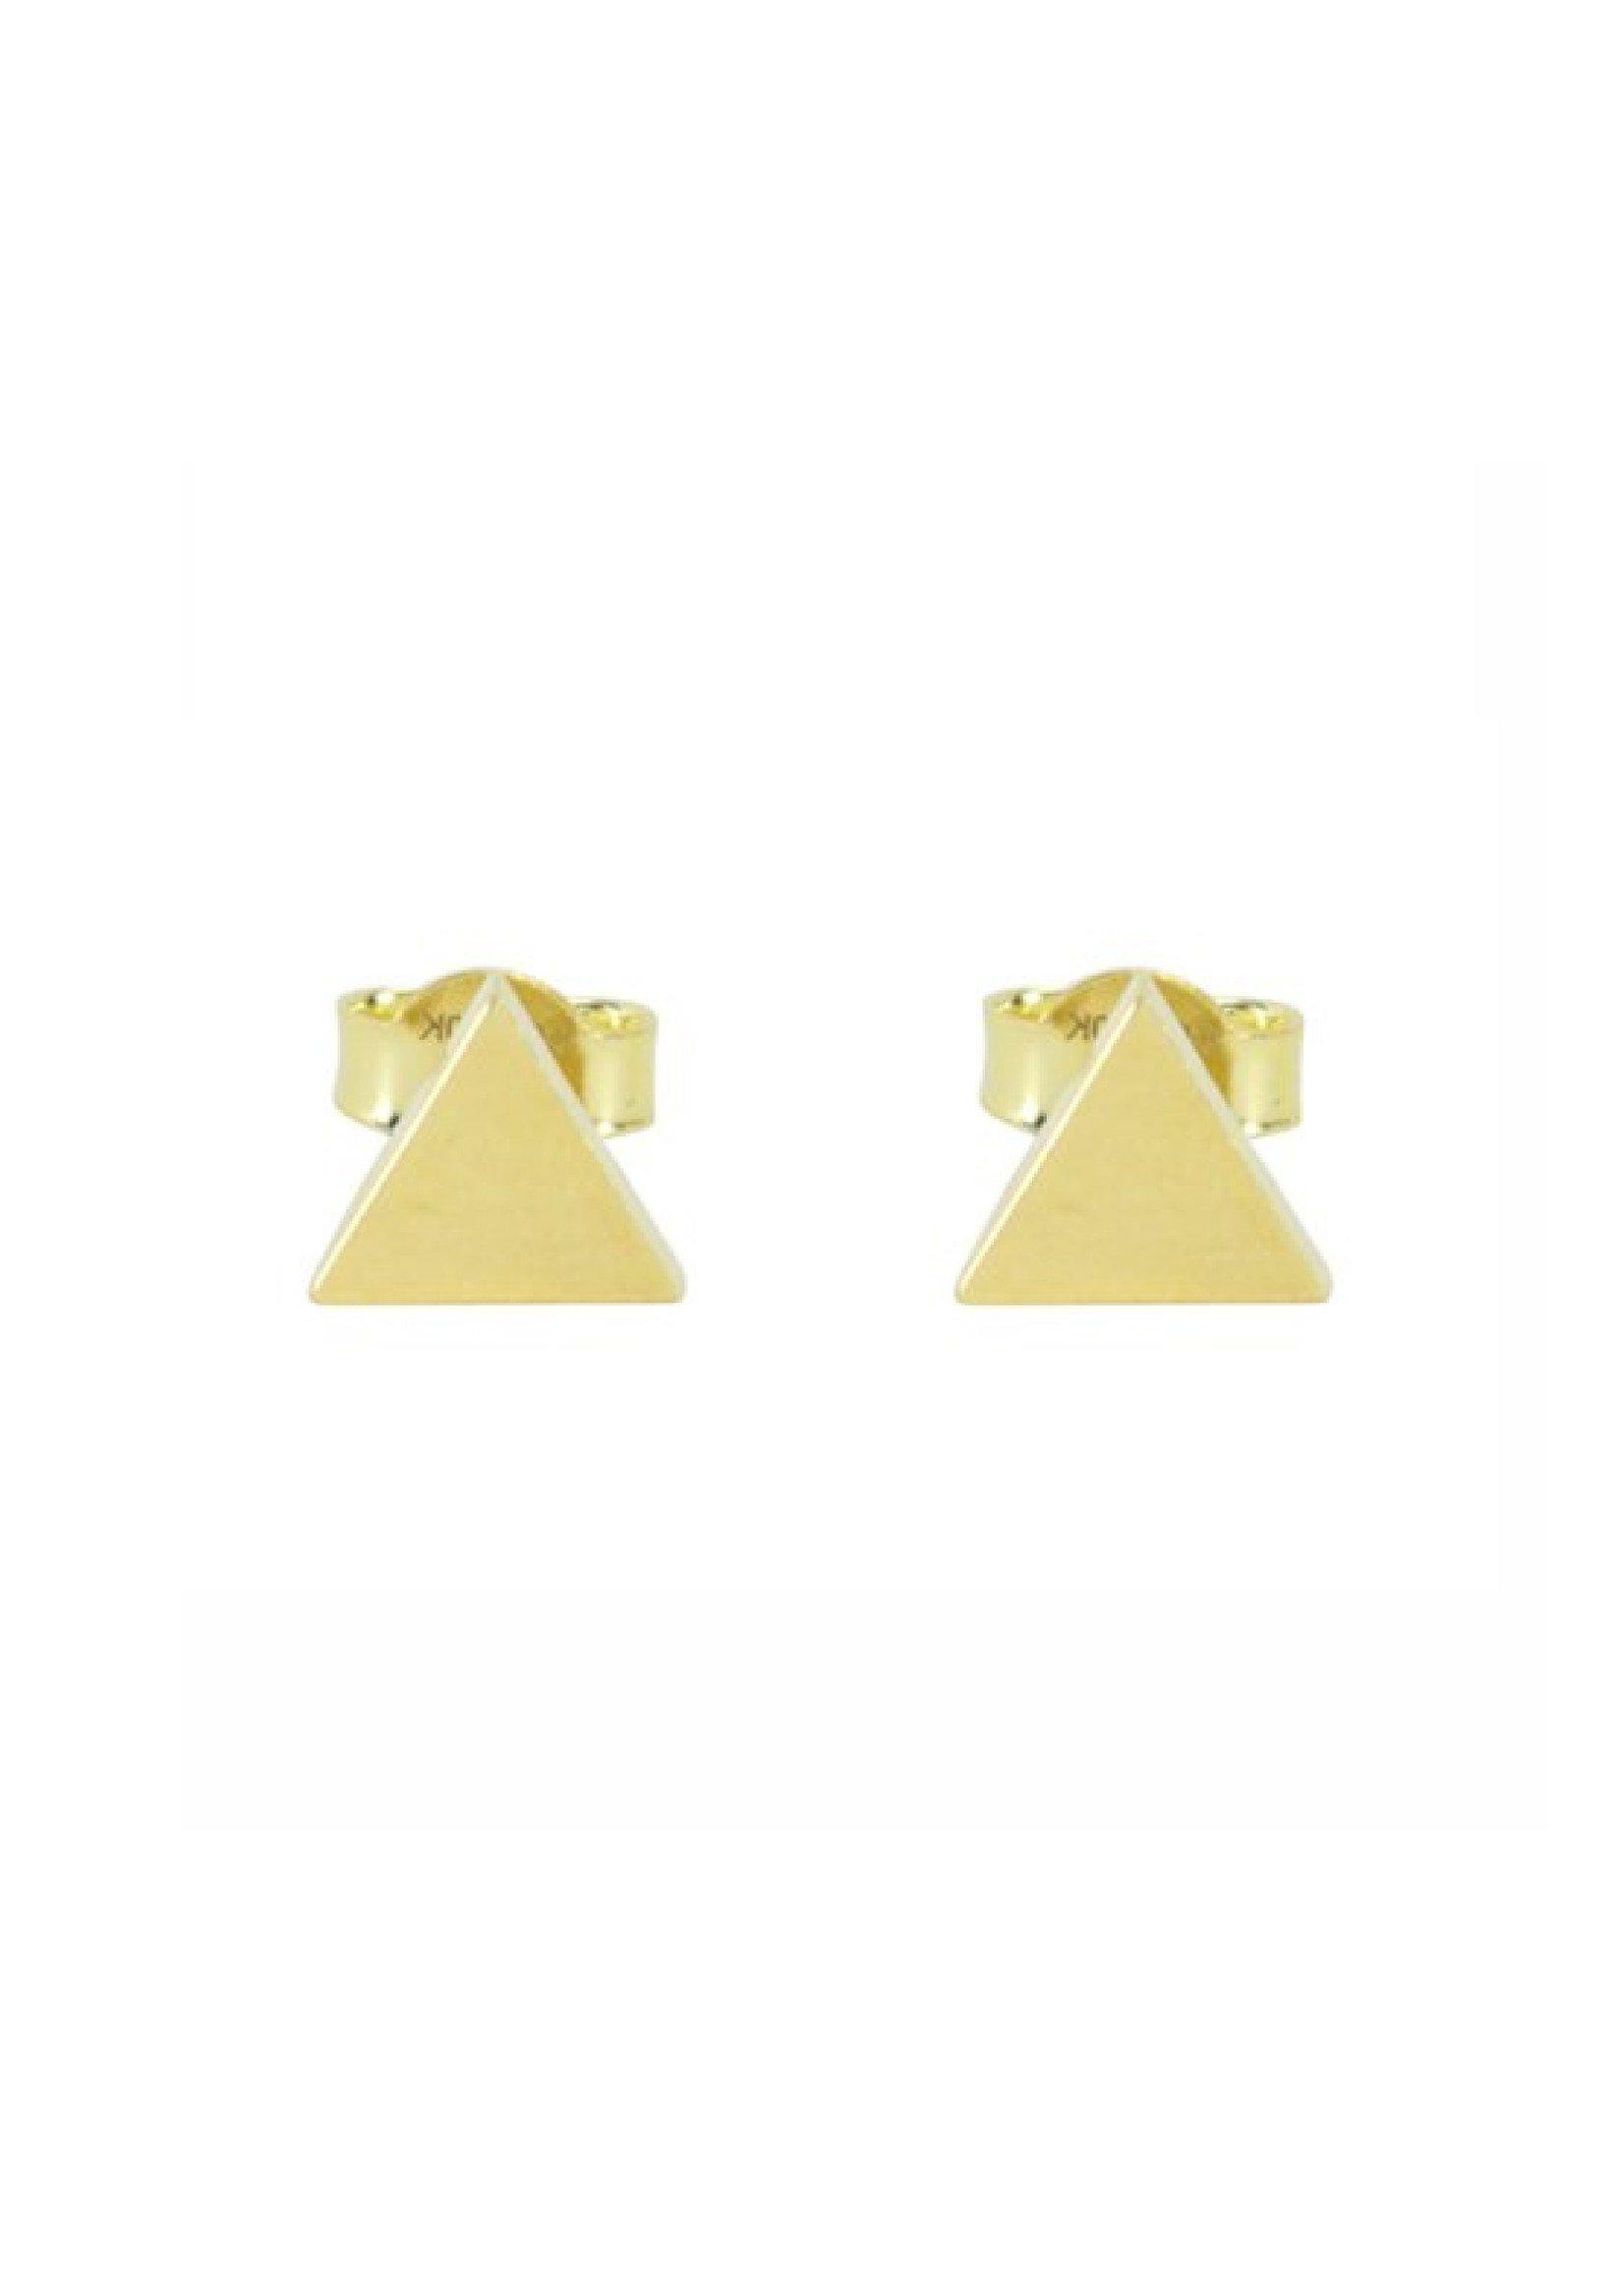 Boucles d'oreilles Triangles Stud  Or 10K